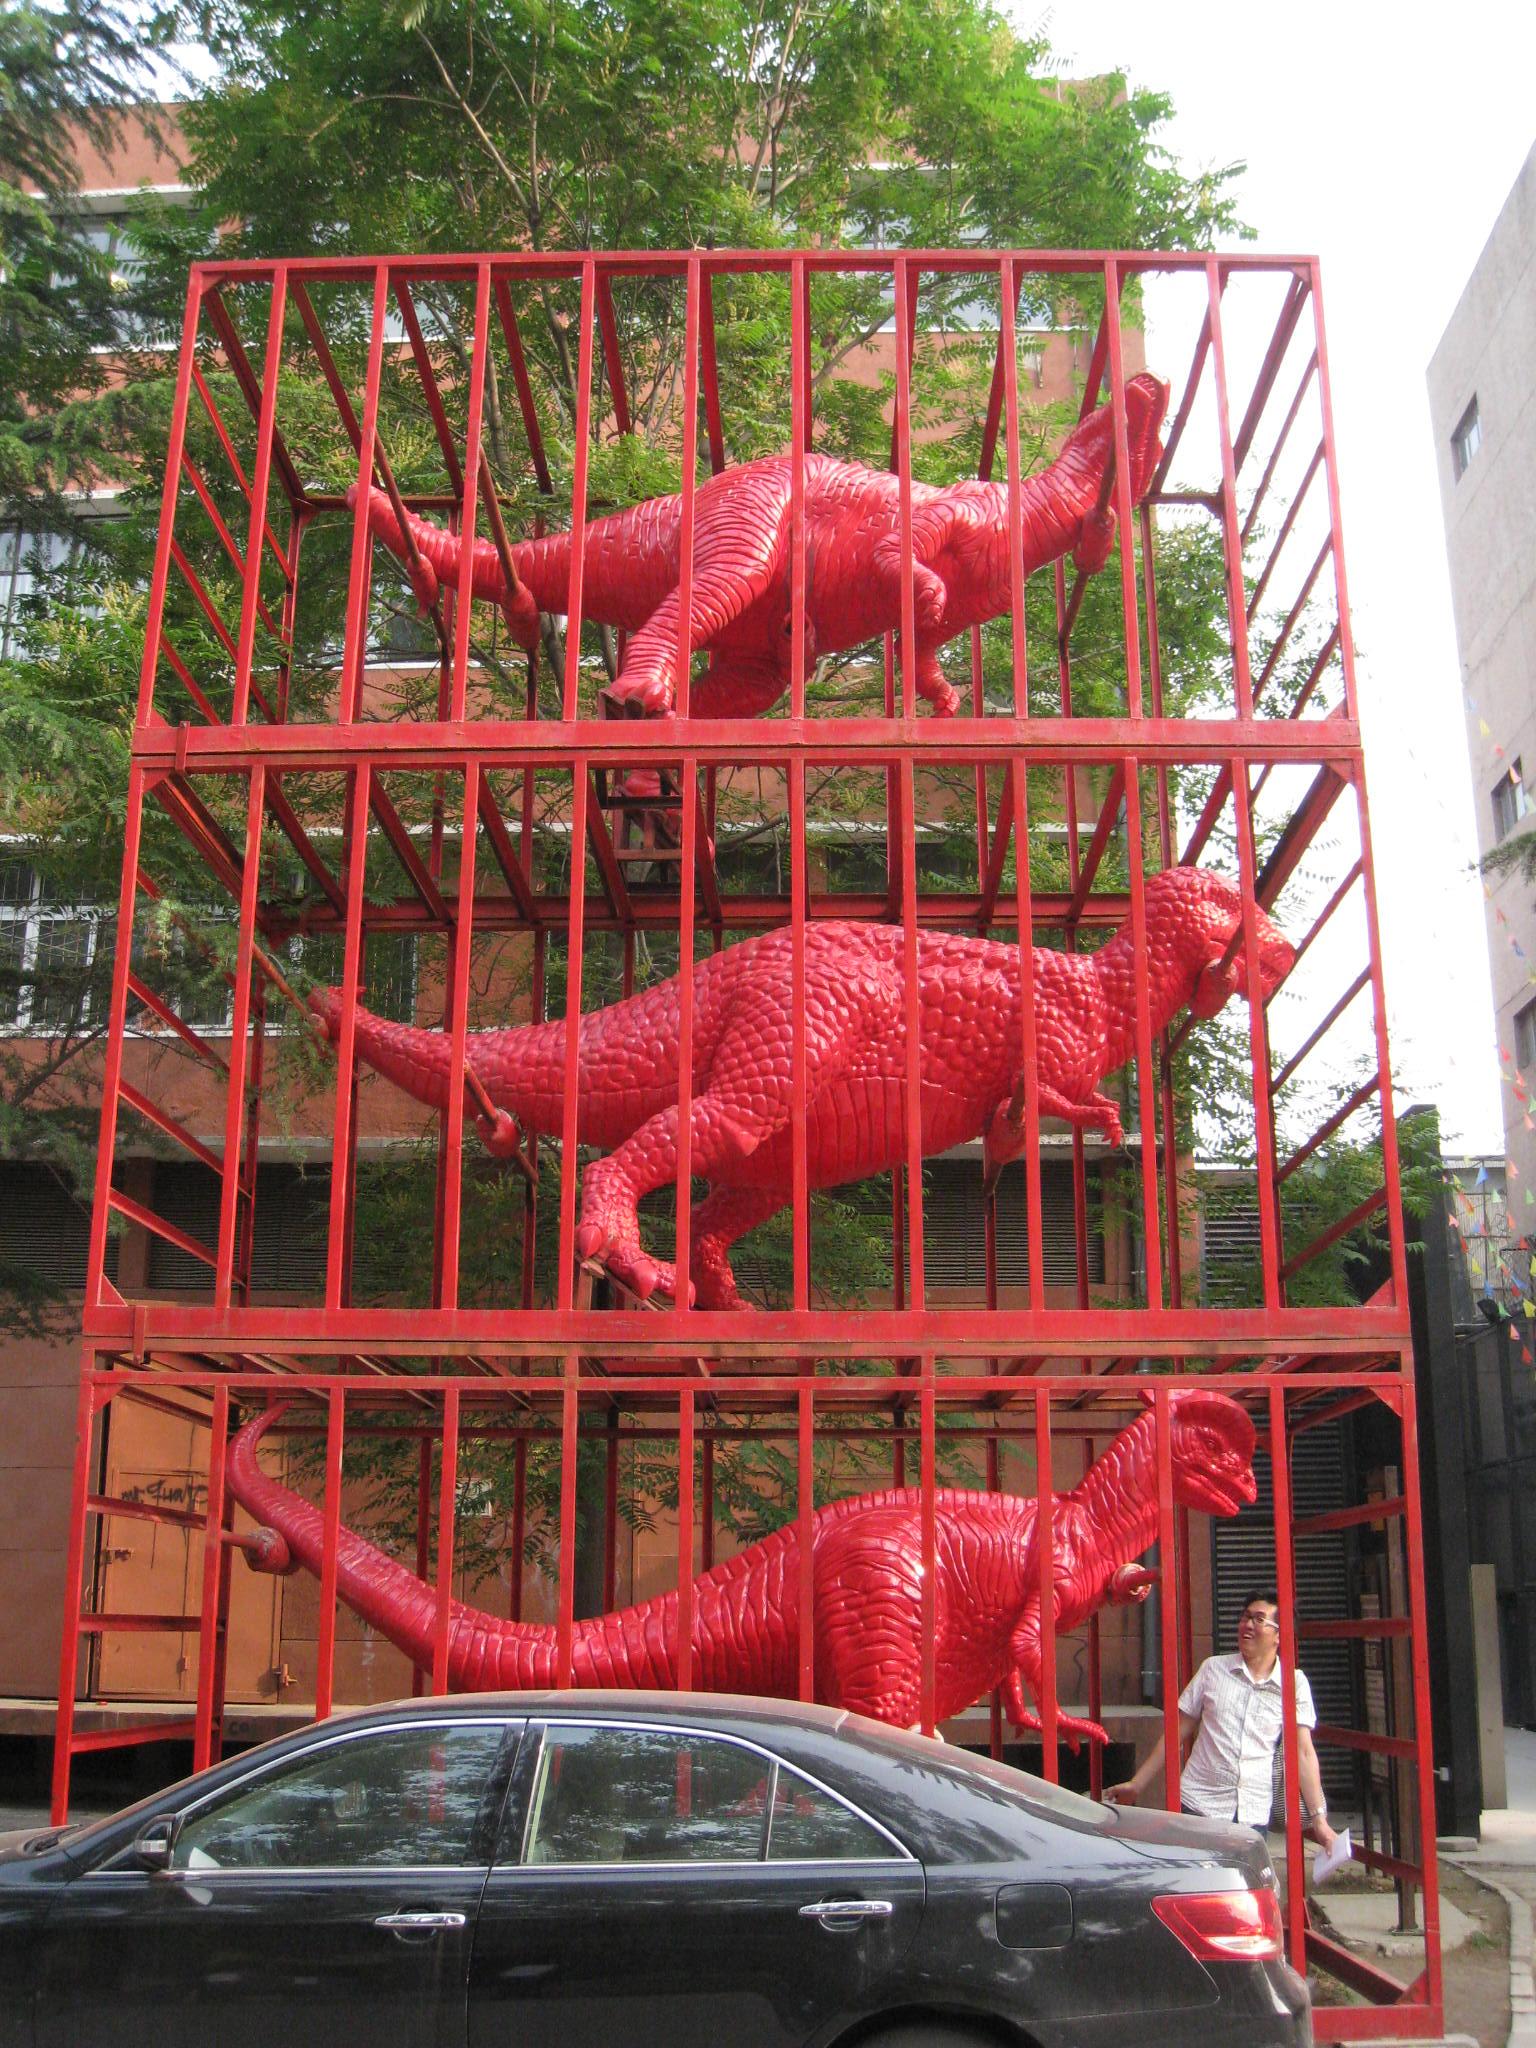 798 Art district art installation